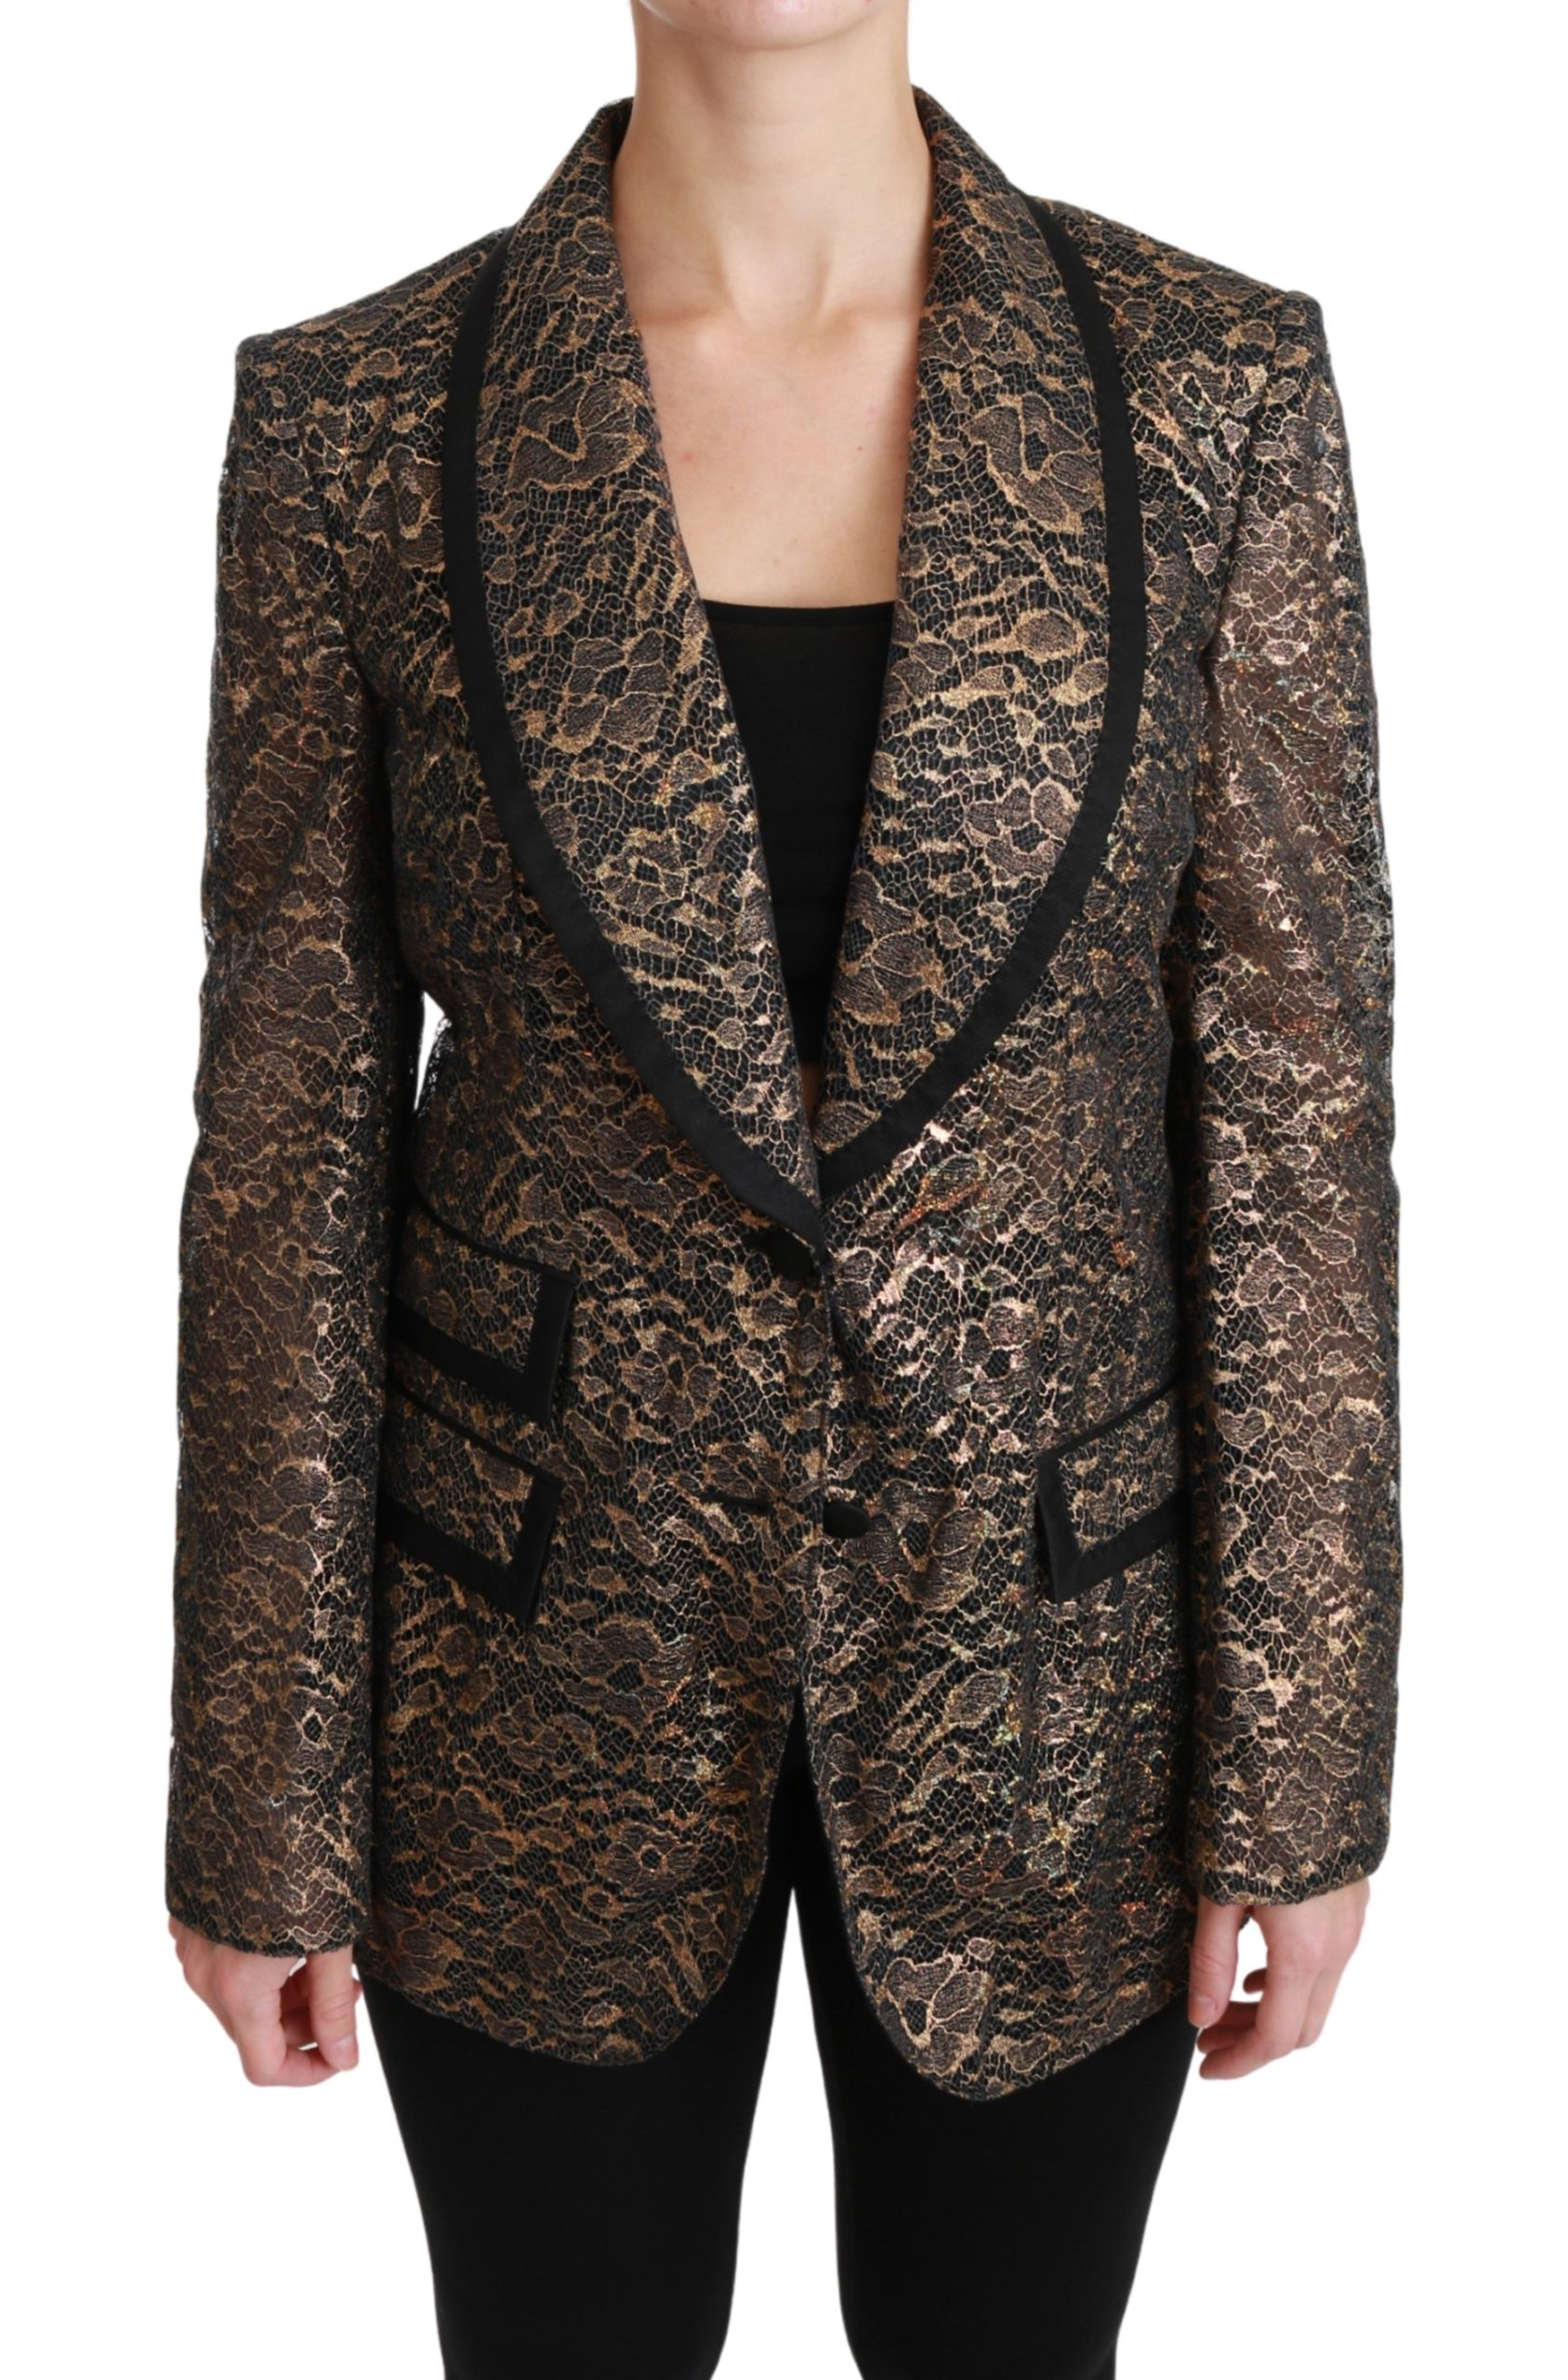 Dolce & Gabbana Women's Lace Floral Blazer Jacket Gold JKT2562 - IT44|L